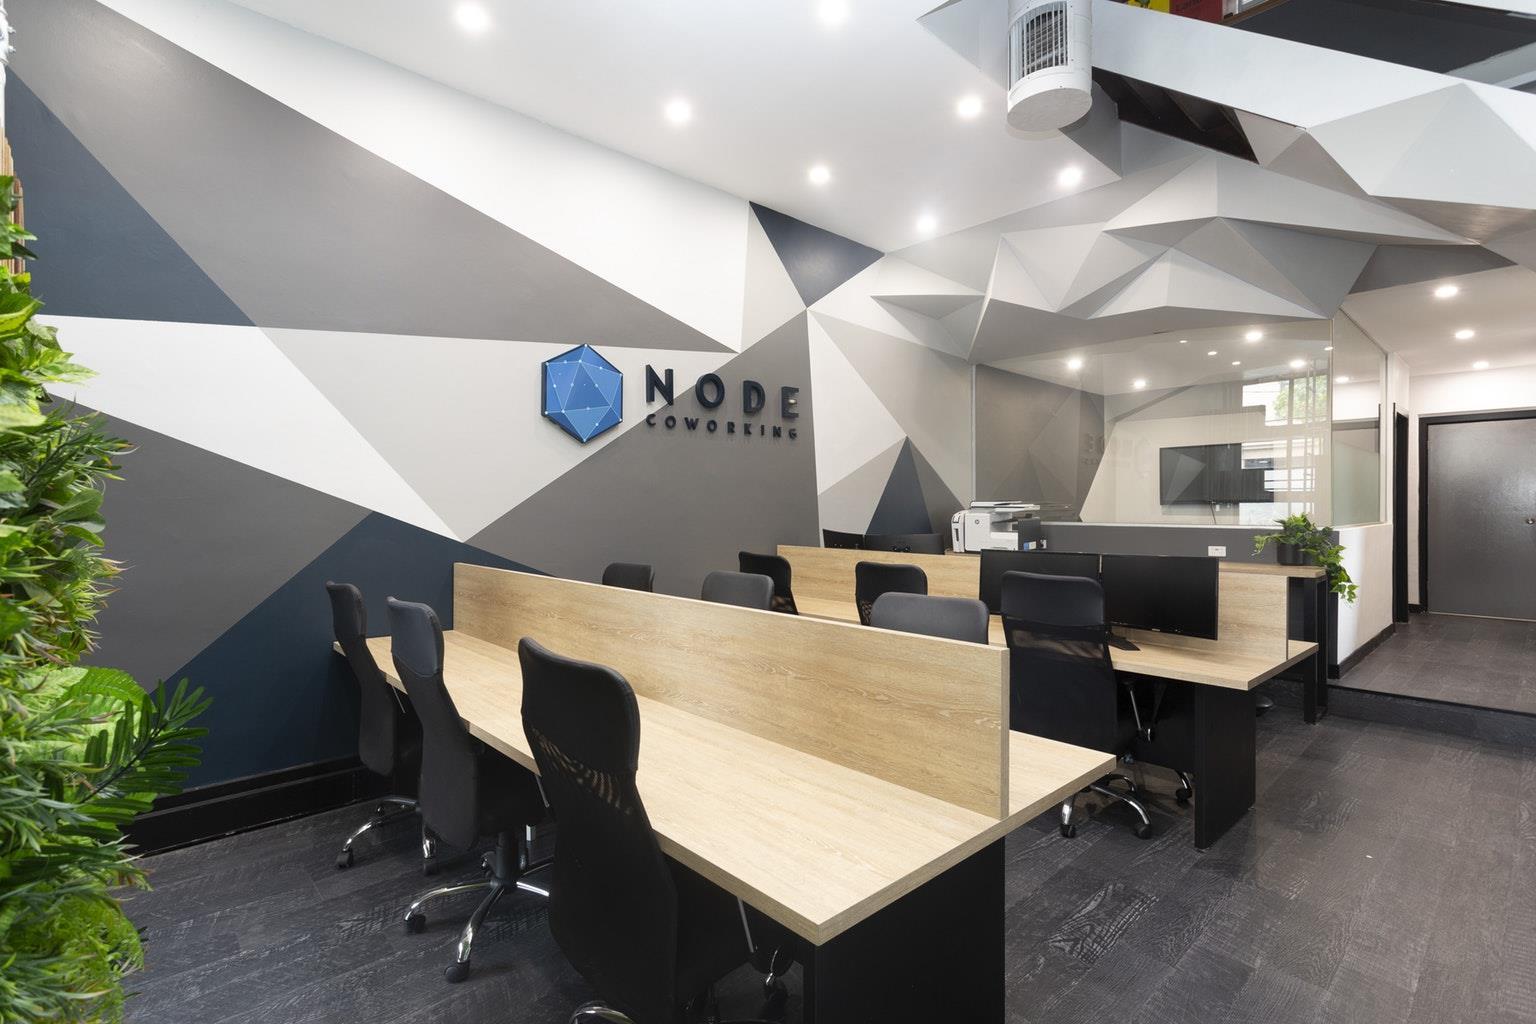 Node Coworking - Permanent Desk